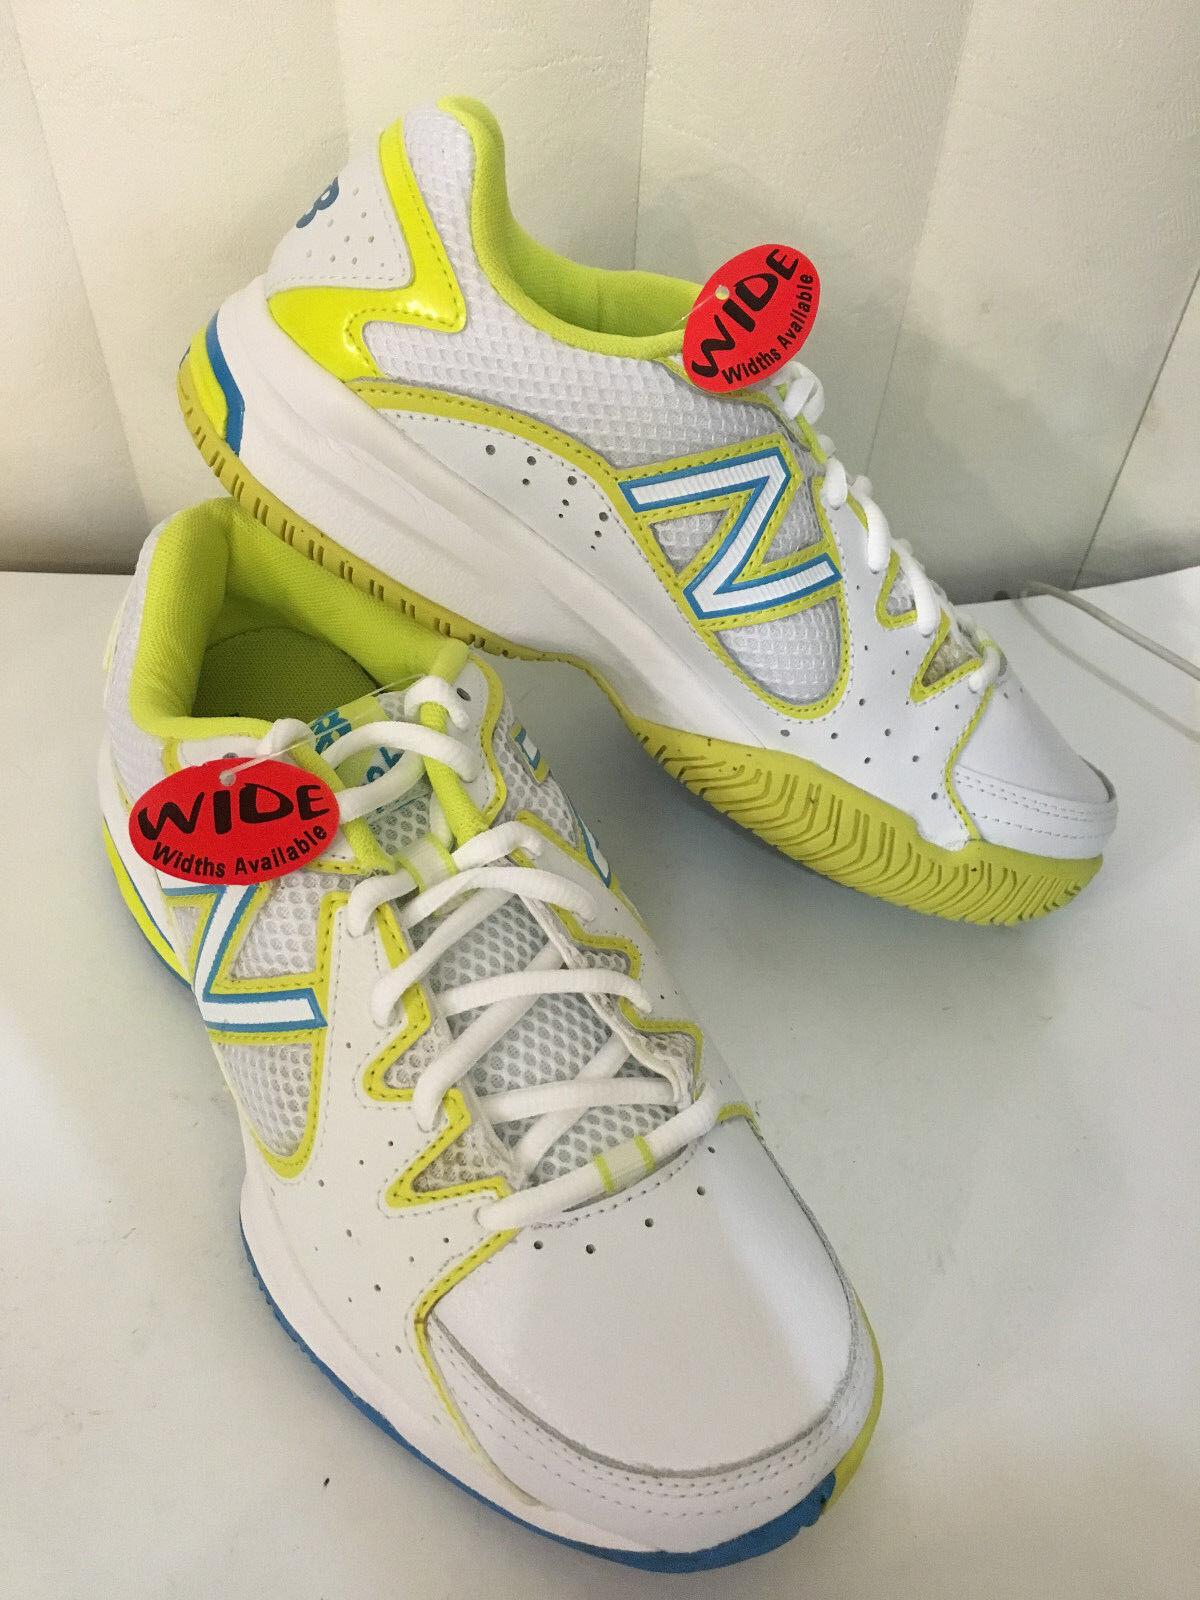 New Balance WC786YB Wouomo Tennis bianca giallo blu scarpe Dimensione 7, 8.5 D (Wide)